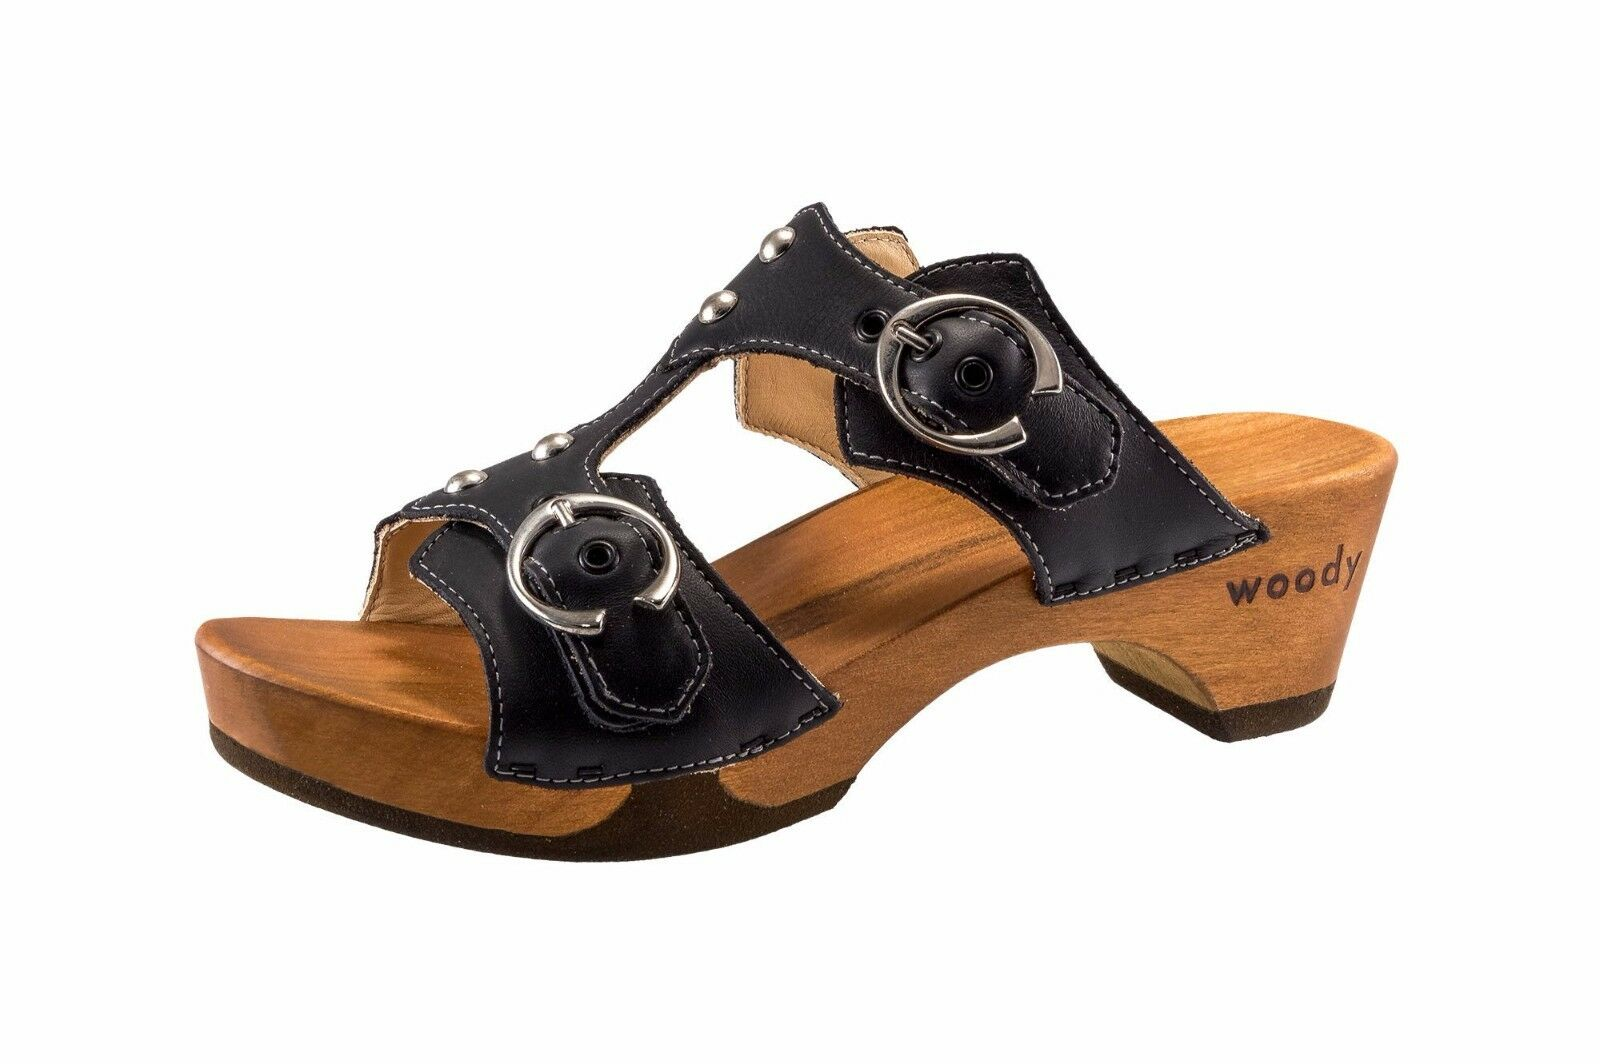 Woody Ladies Sandals wood-o-flex Leonie Black New Size 37 up to 39